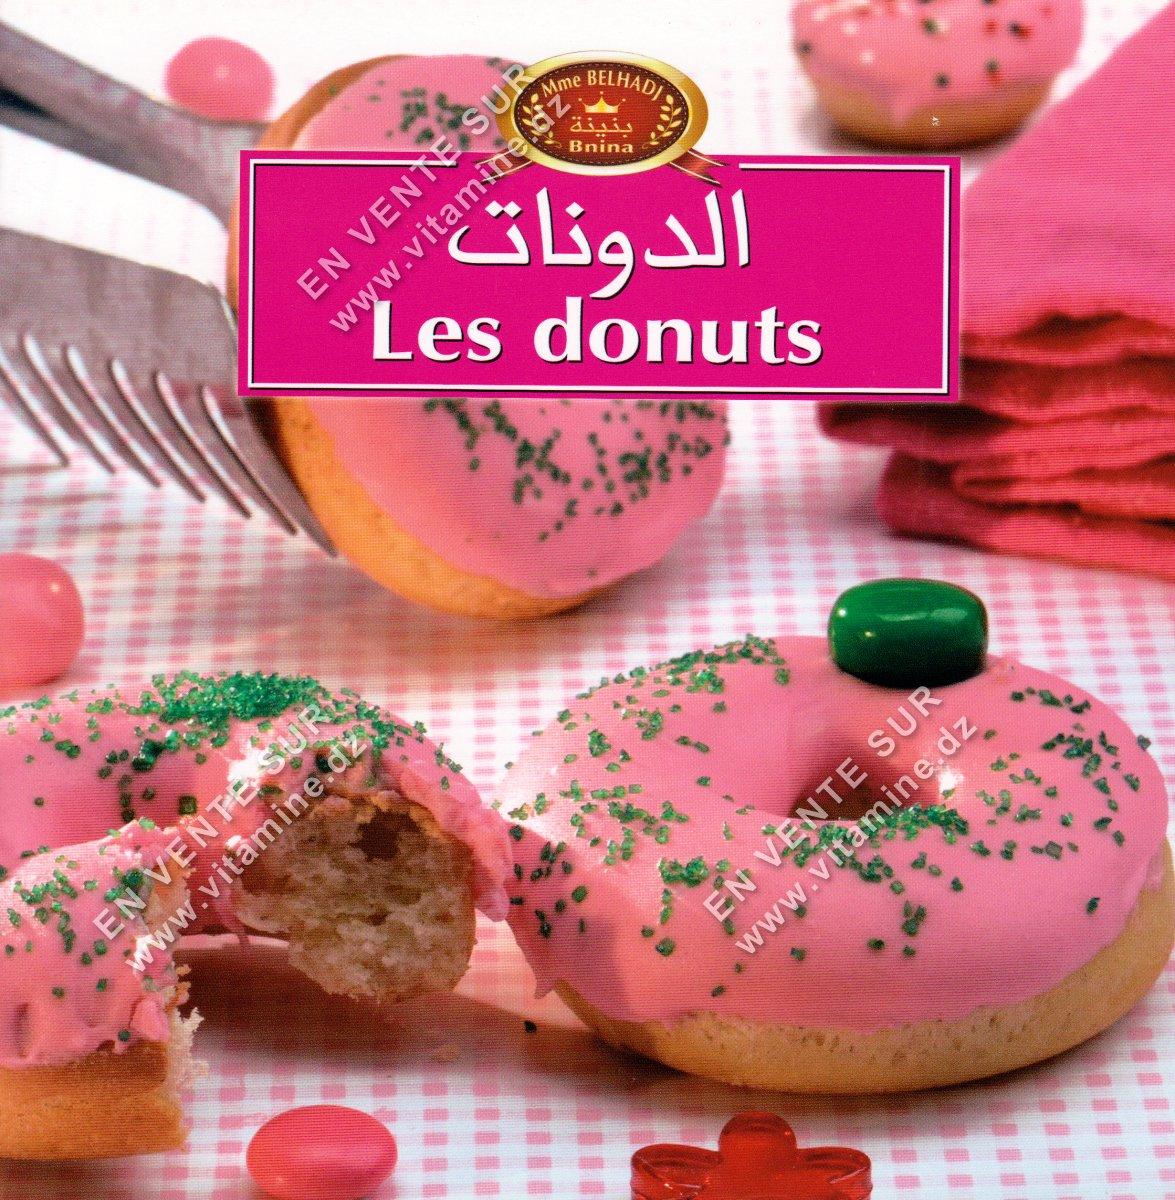 Bnina - Les donuts